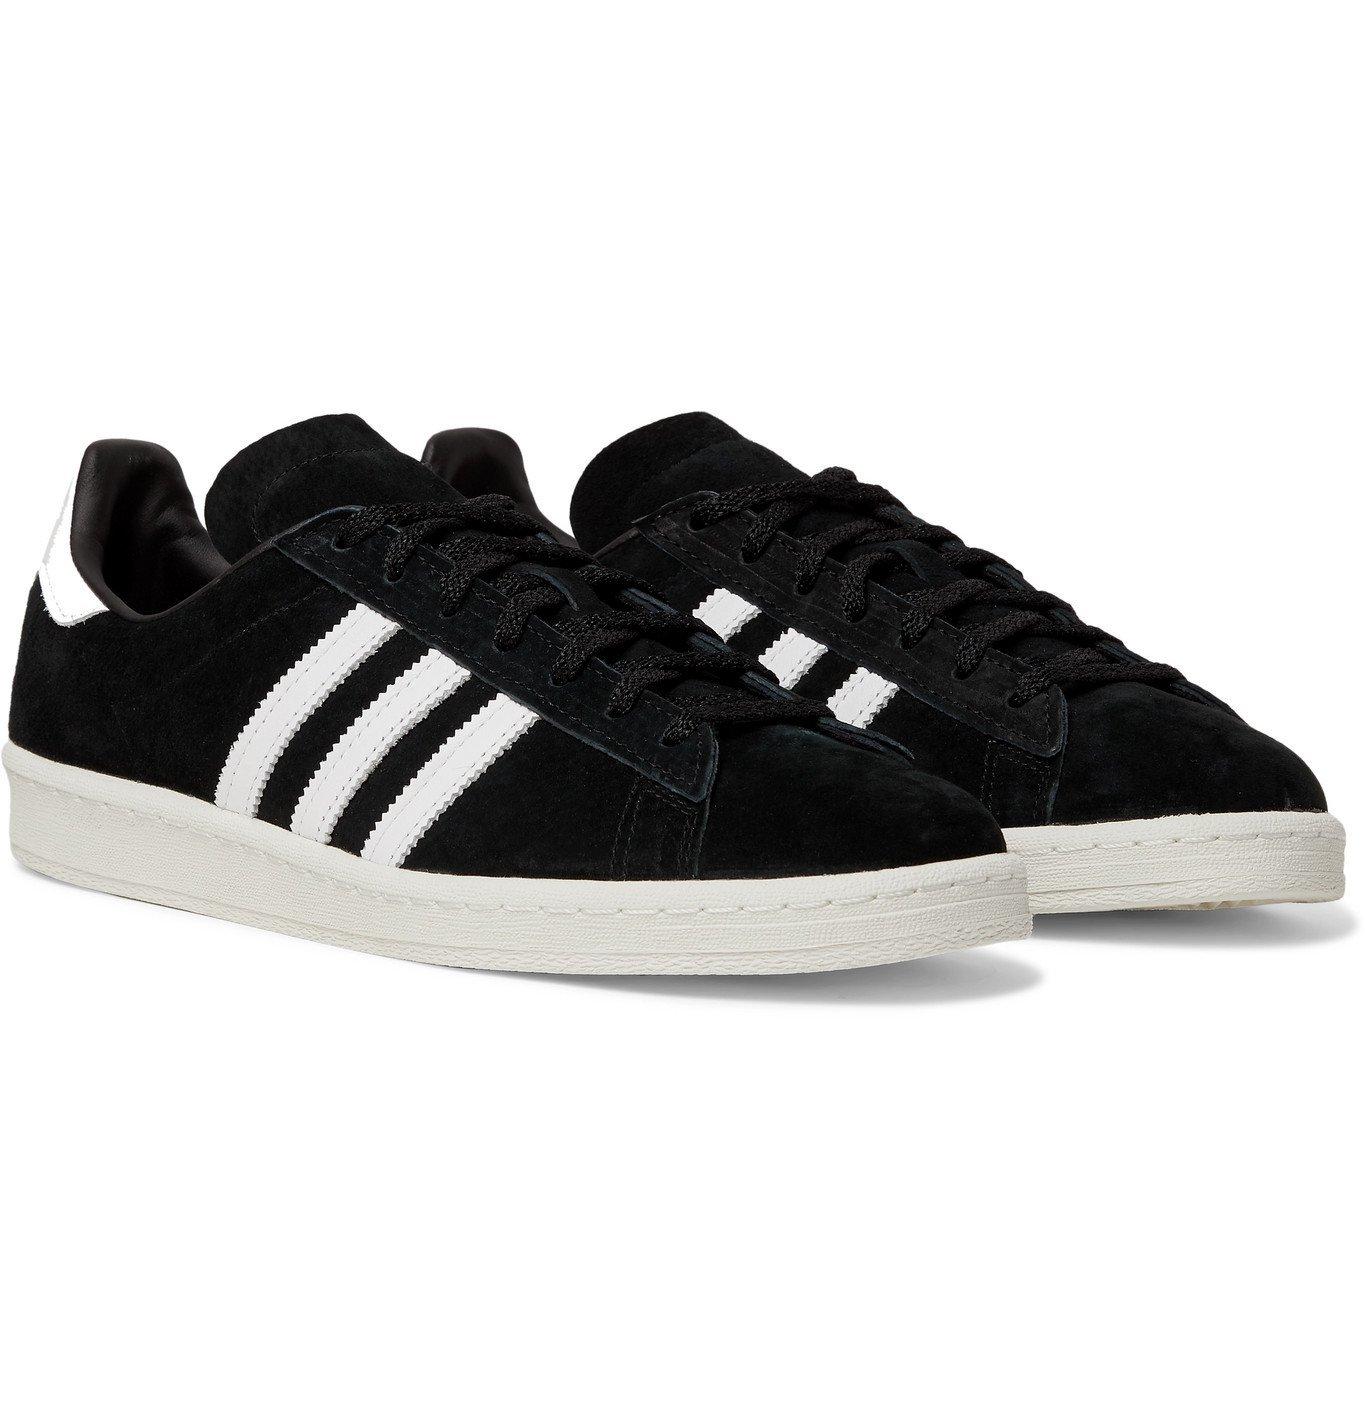 ADIDAS ORIGINALS - Campus 80s Leather-Trimmed Suede Sneakers - Black